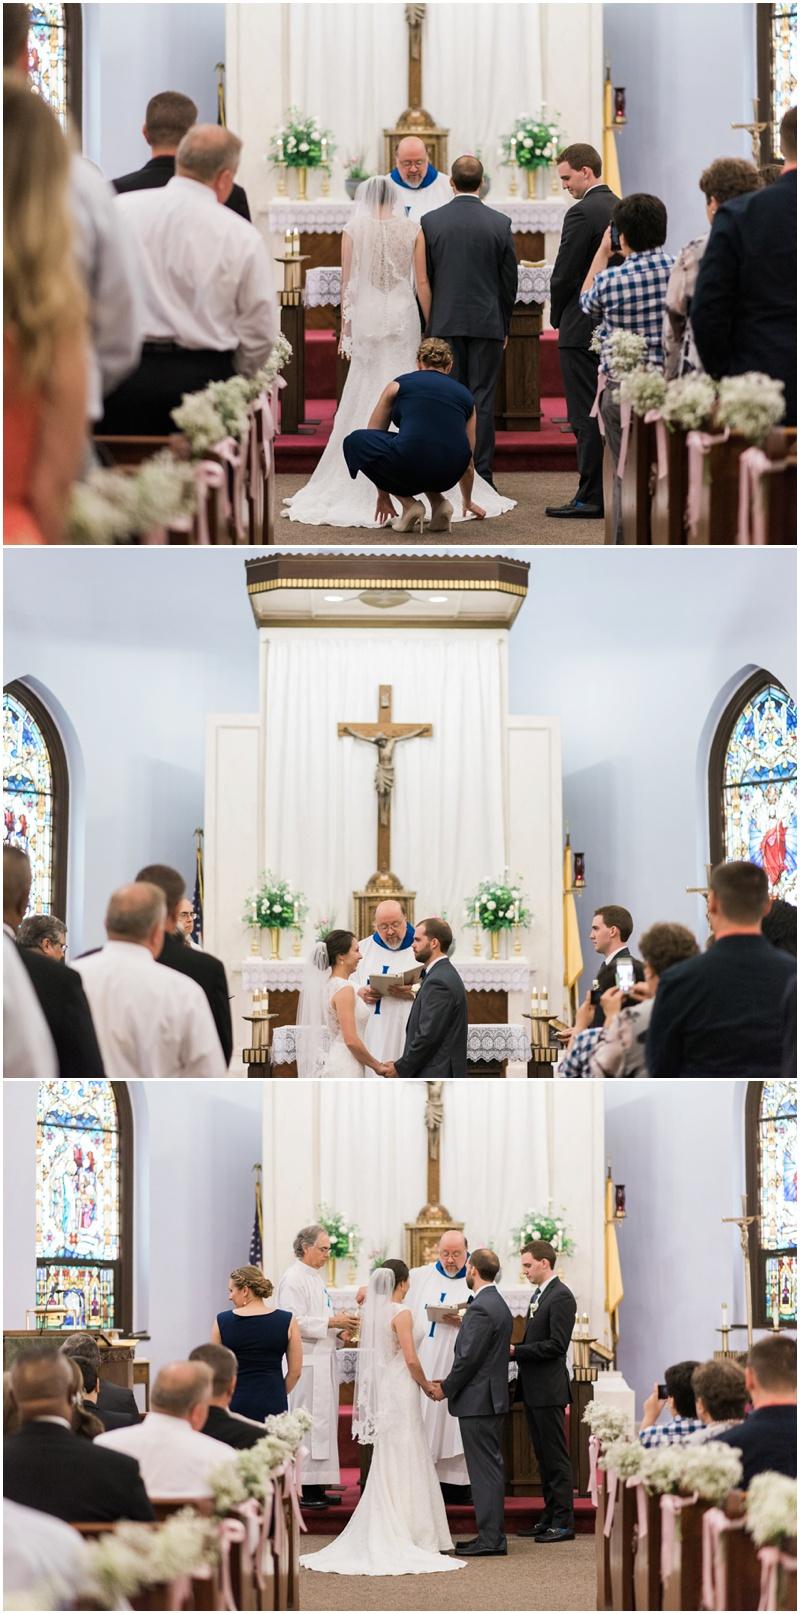 Mccoy-Emmett Wedding-48.JPG